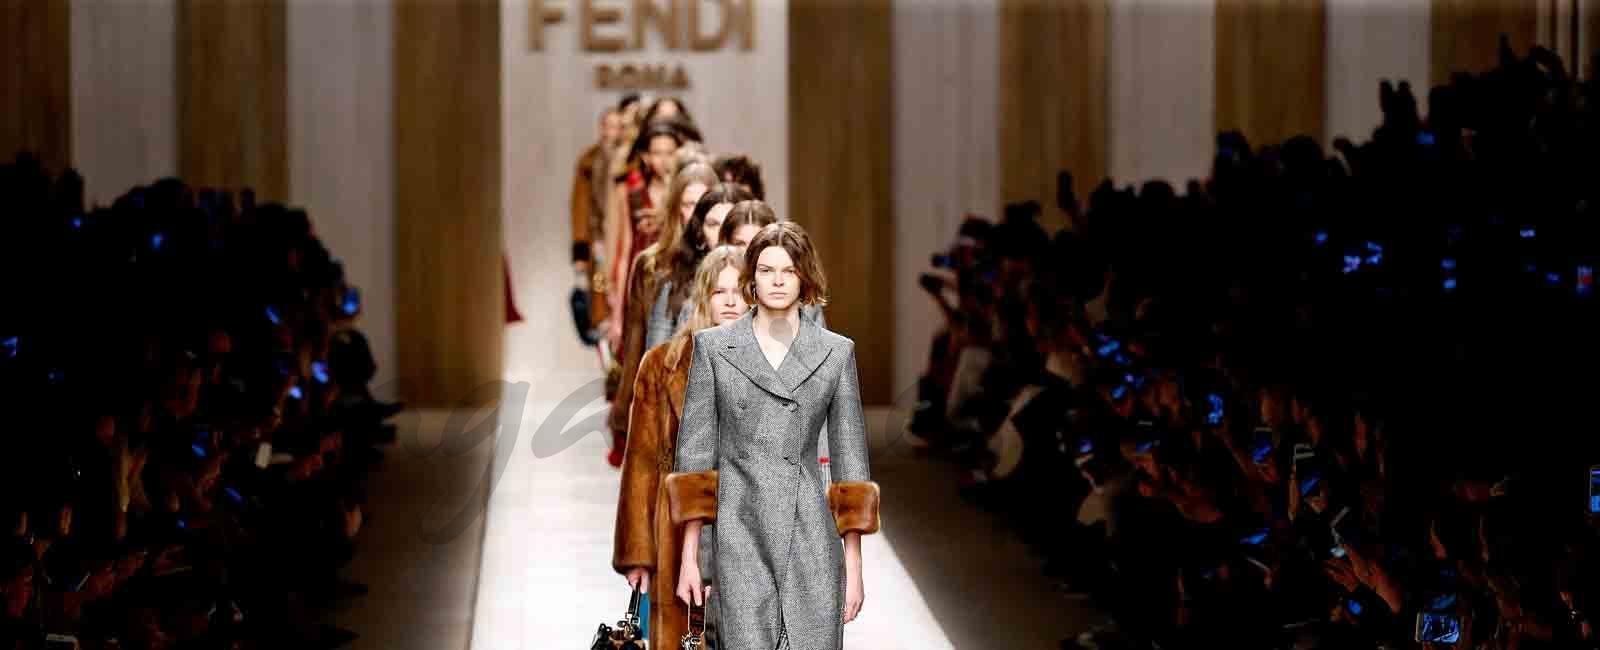 Milán Fashion Week  Fendi Otoño-Invierno 2017 18 - magazinespain.com 6b0e838f0e6f